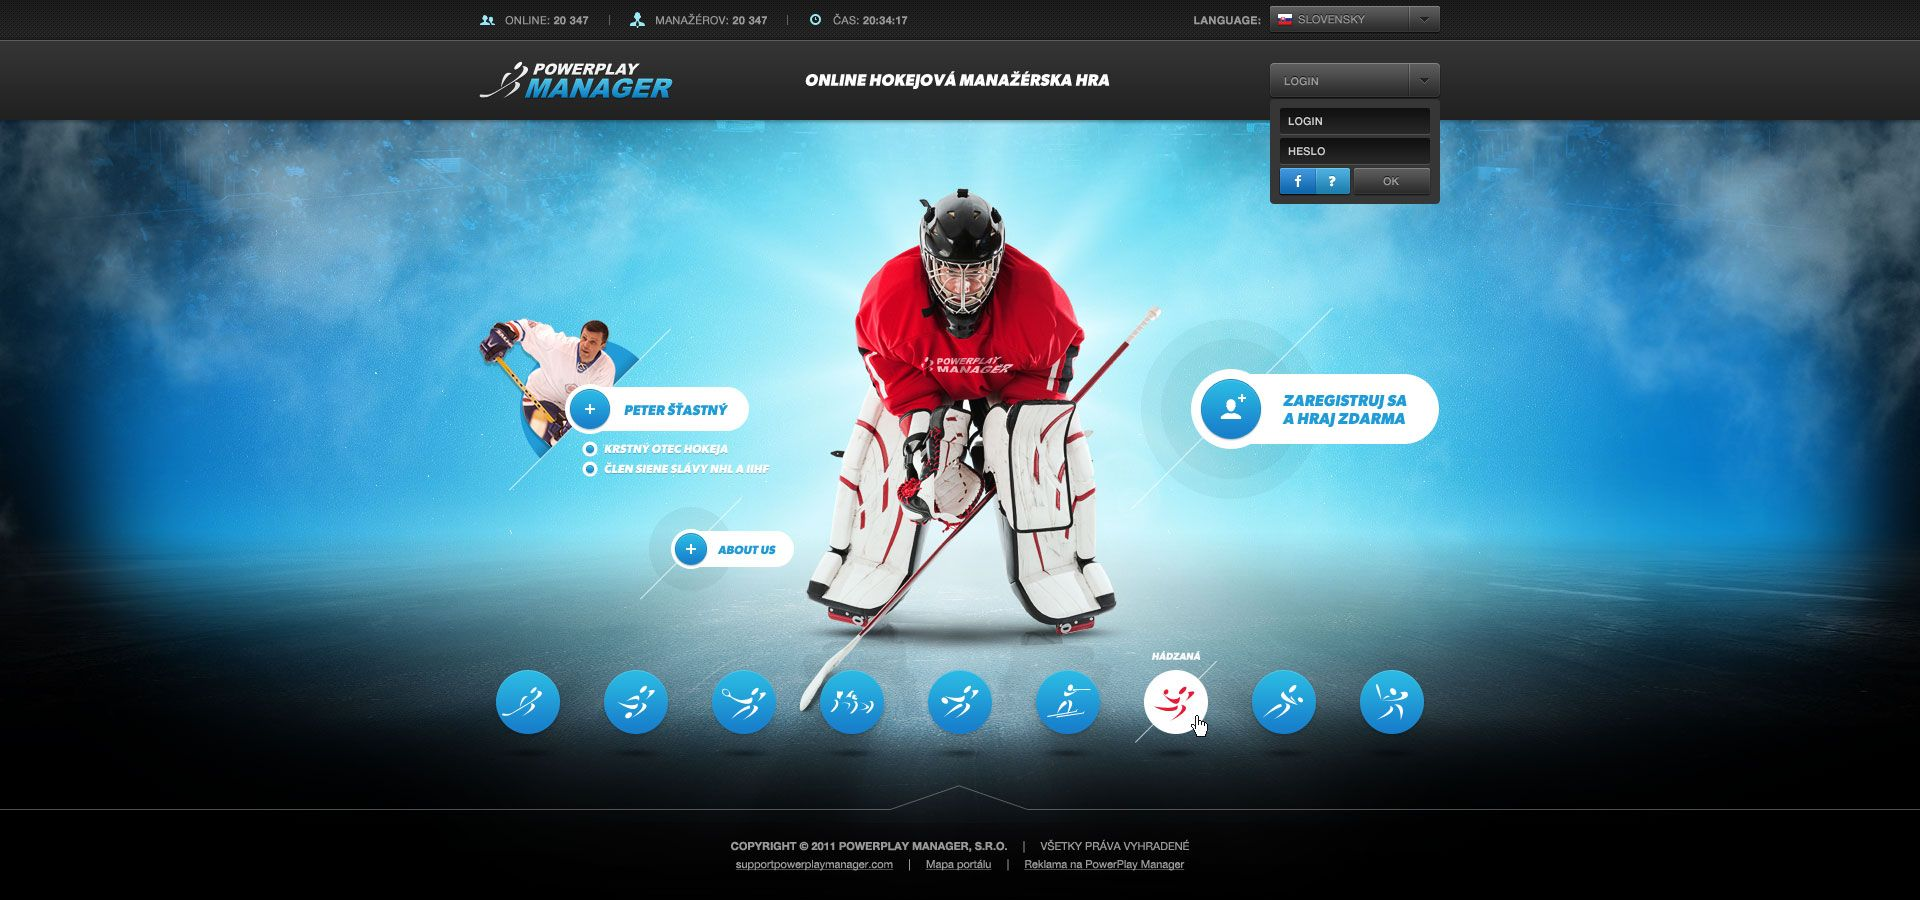 Design Hp Hockey Jpg 1920 900 Design Desktop Screenshot